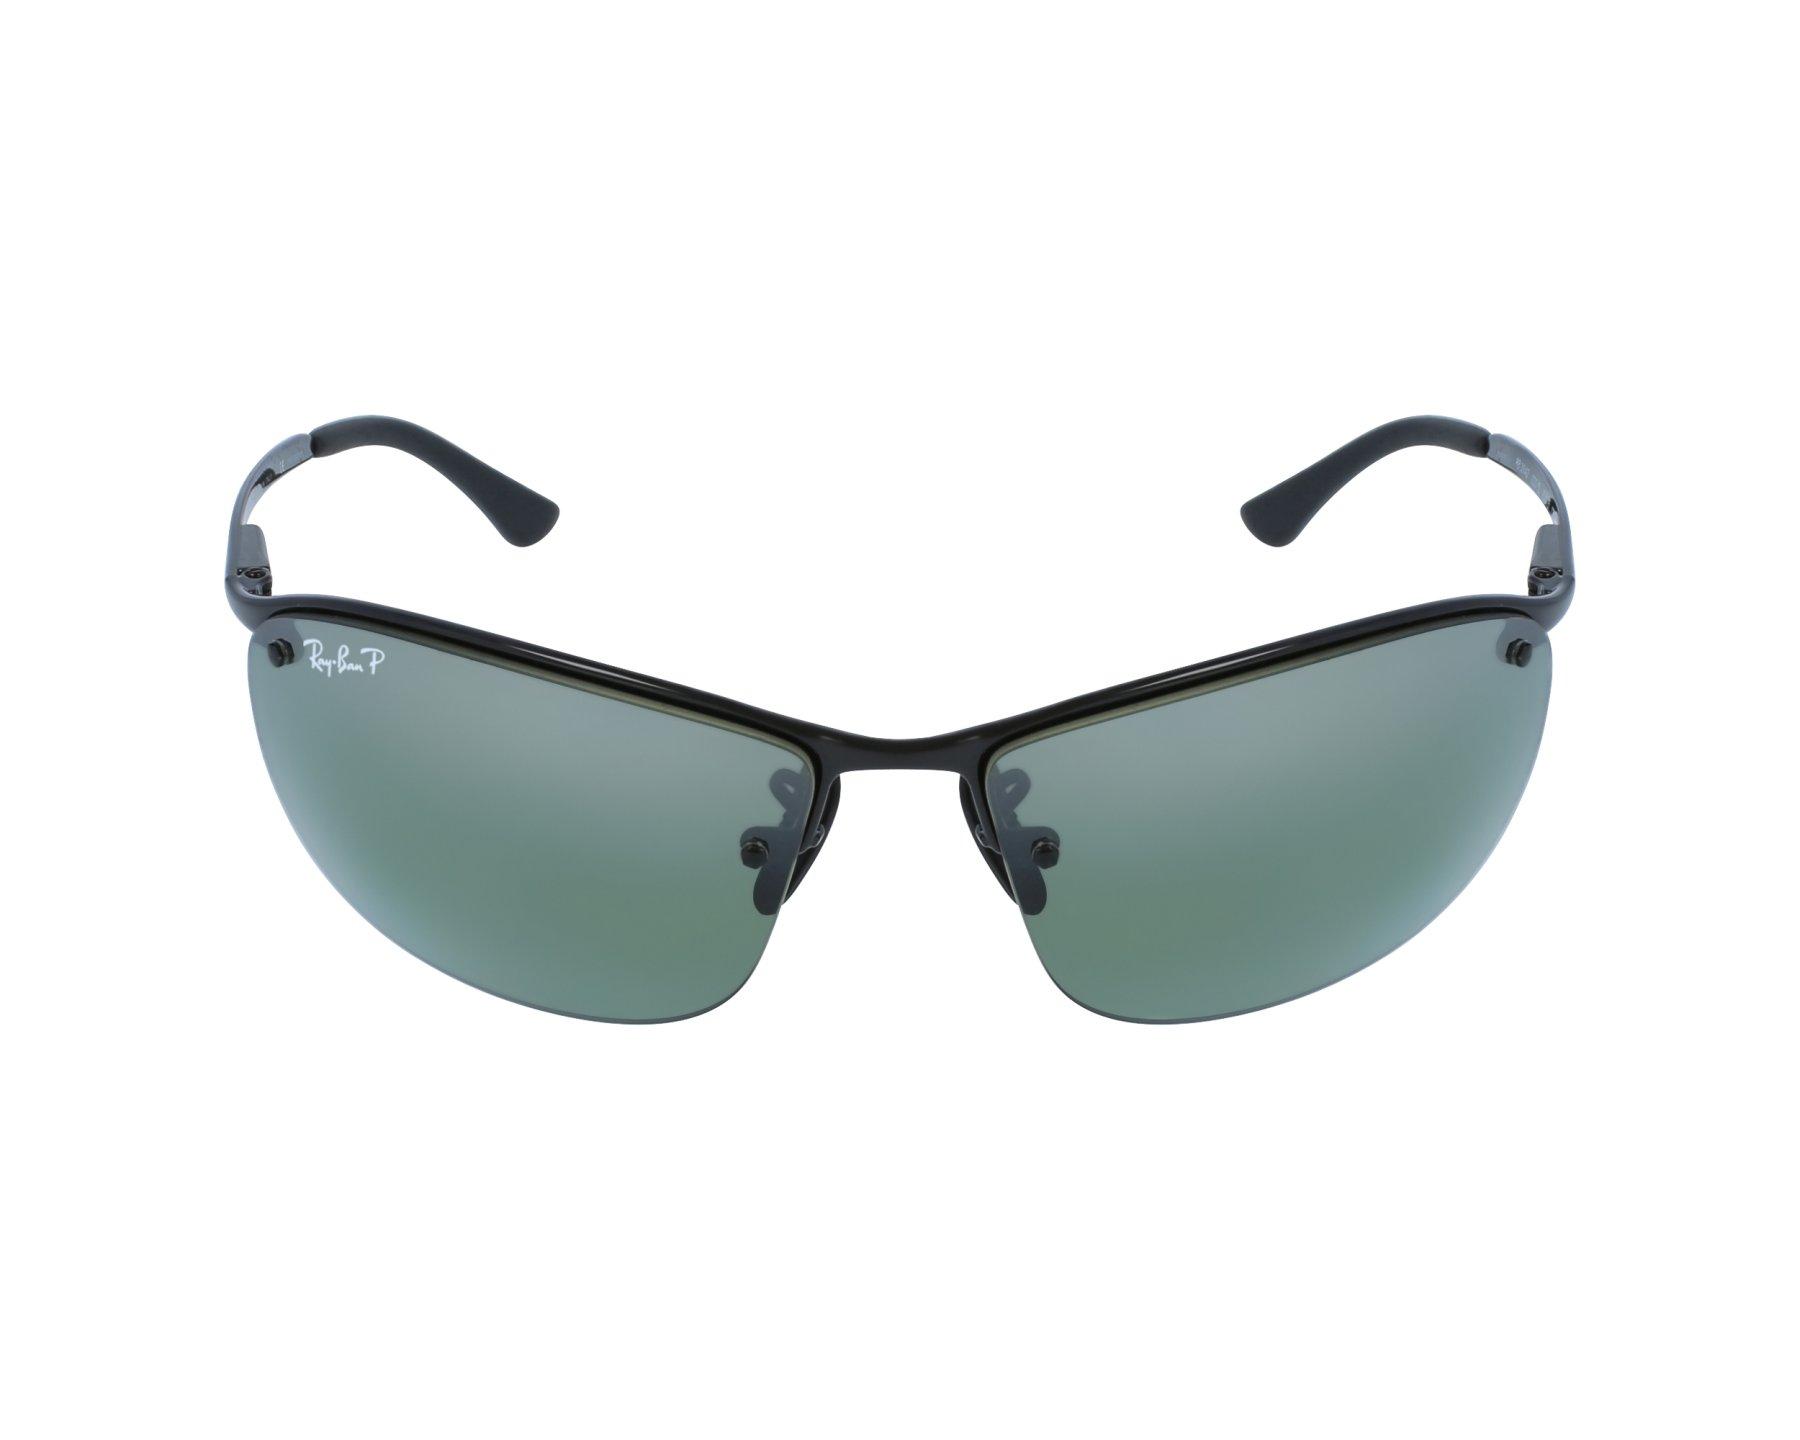 0b647752ef thumbnail Sunglasses Ray-Ban RB-3542 002 5L 63-15 Black profile